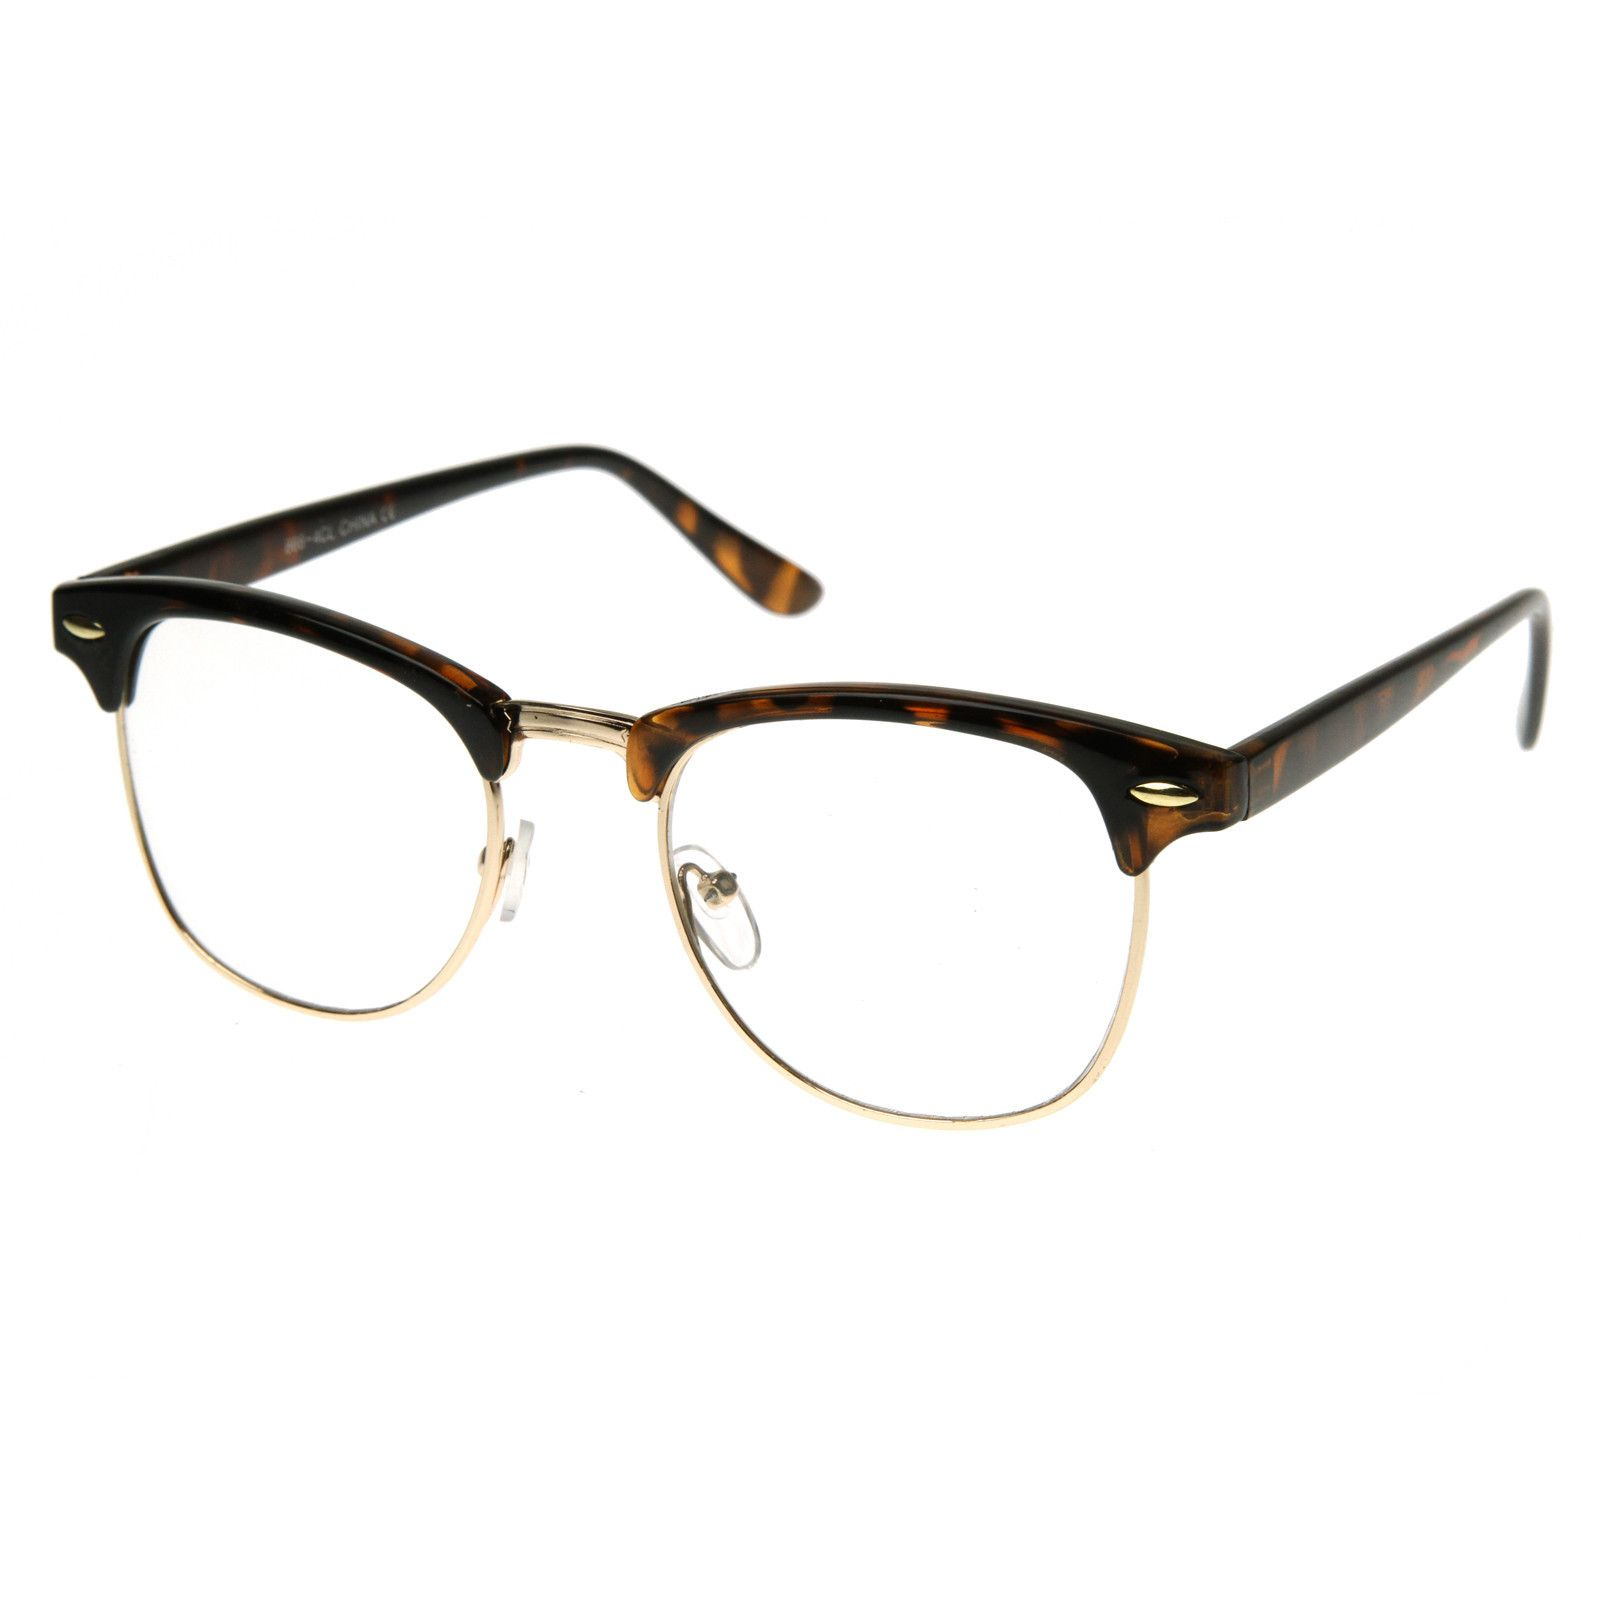 92136f3291a7f Vintage Inspired Classic Horned Rim Half Frame Clear Lens Glasses 2933